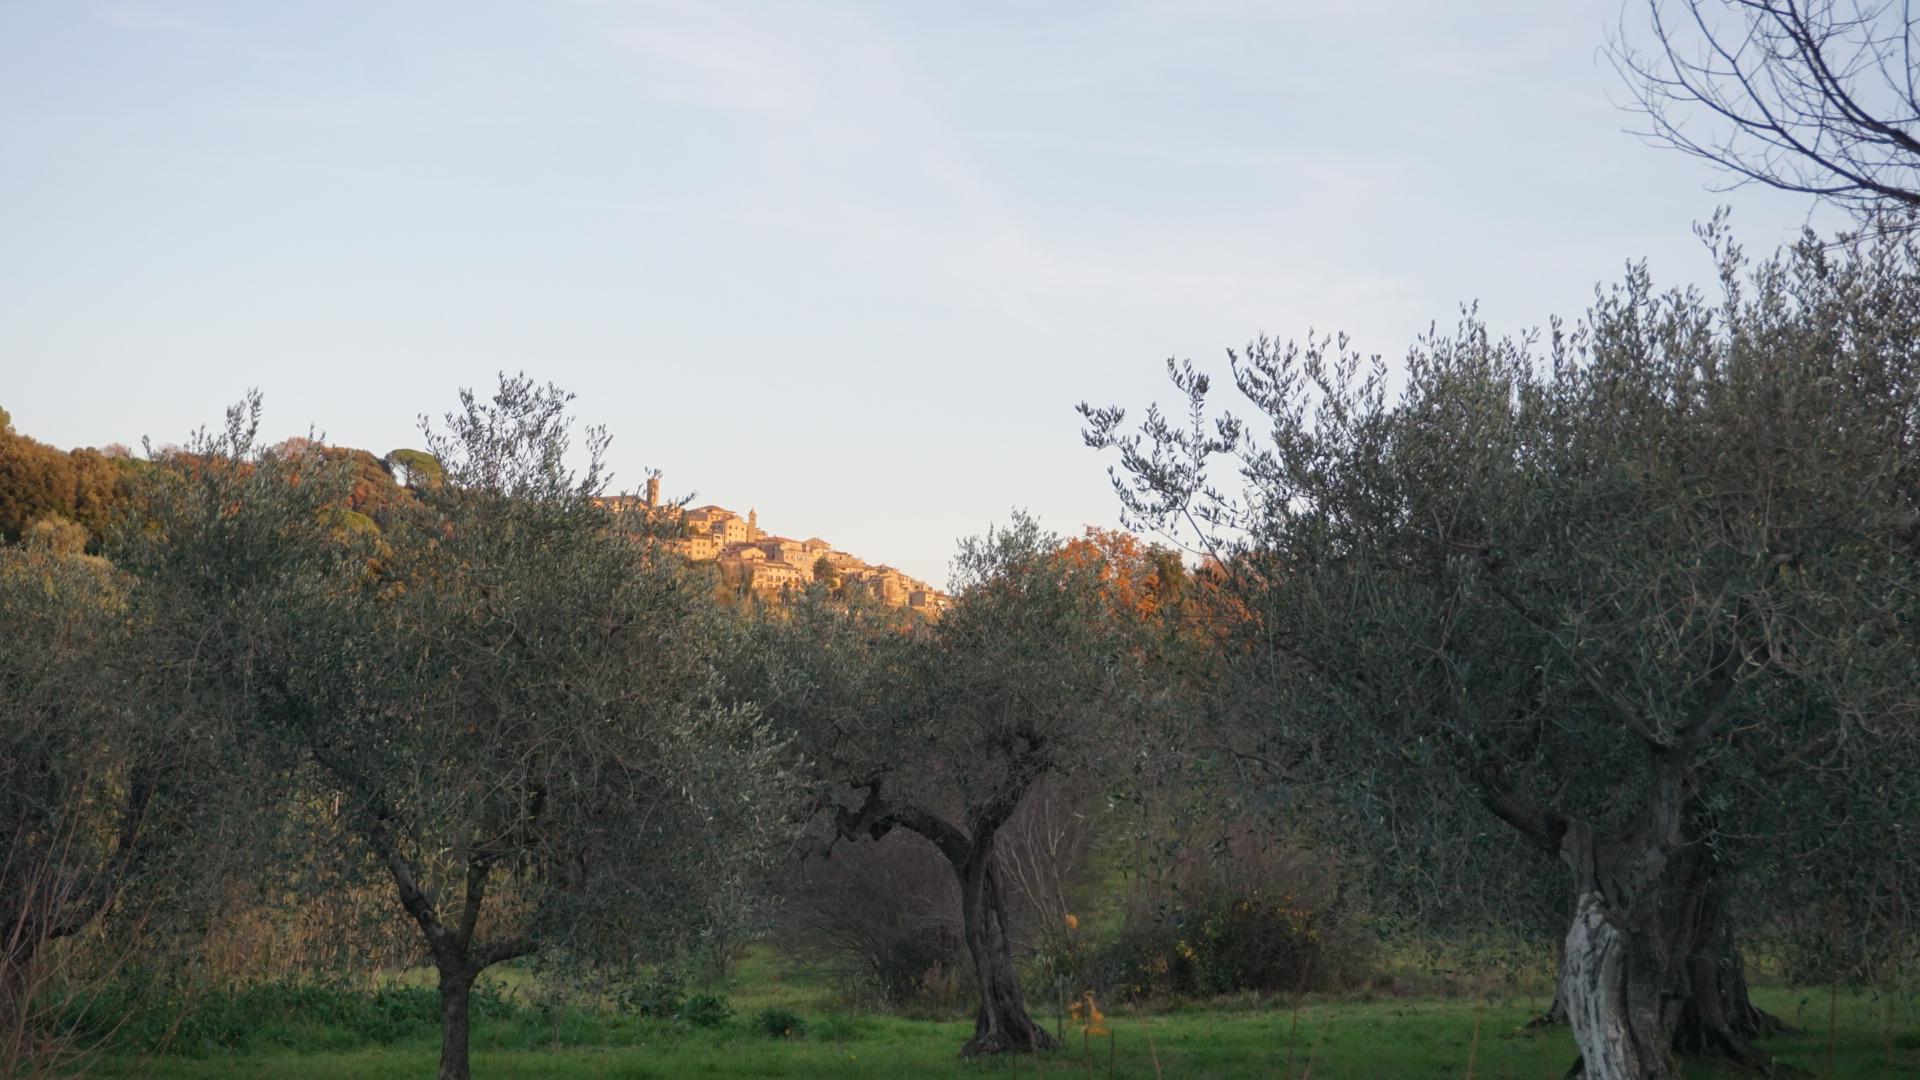 Olive - Olio Extravergine d'oliva - Casale Marittimo, Toscana - Podere Fornelli